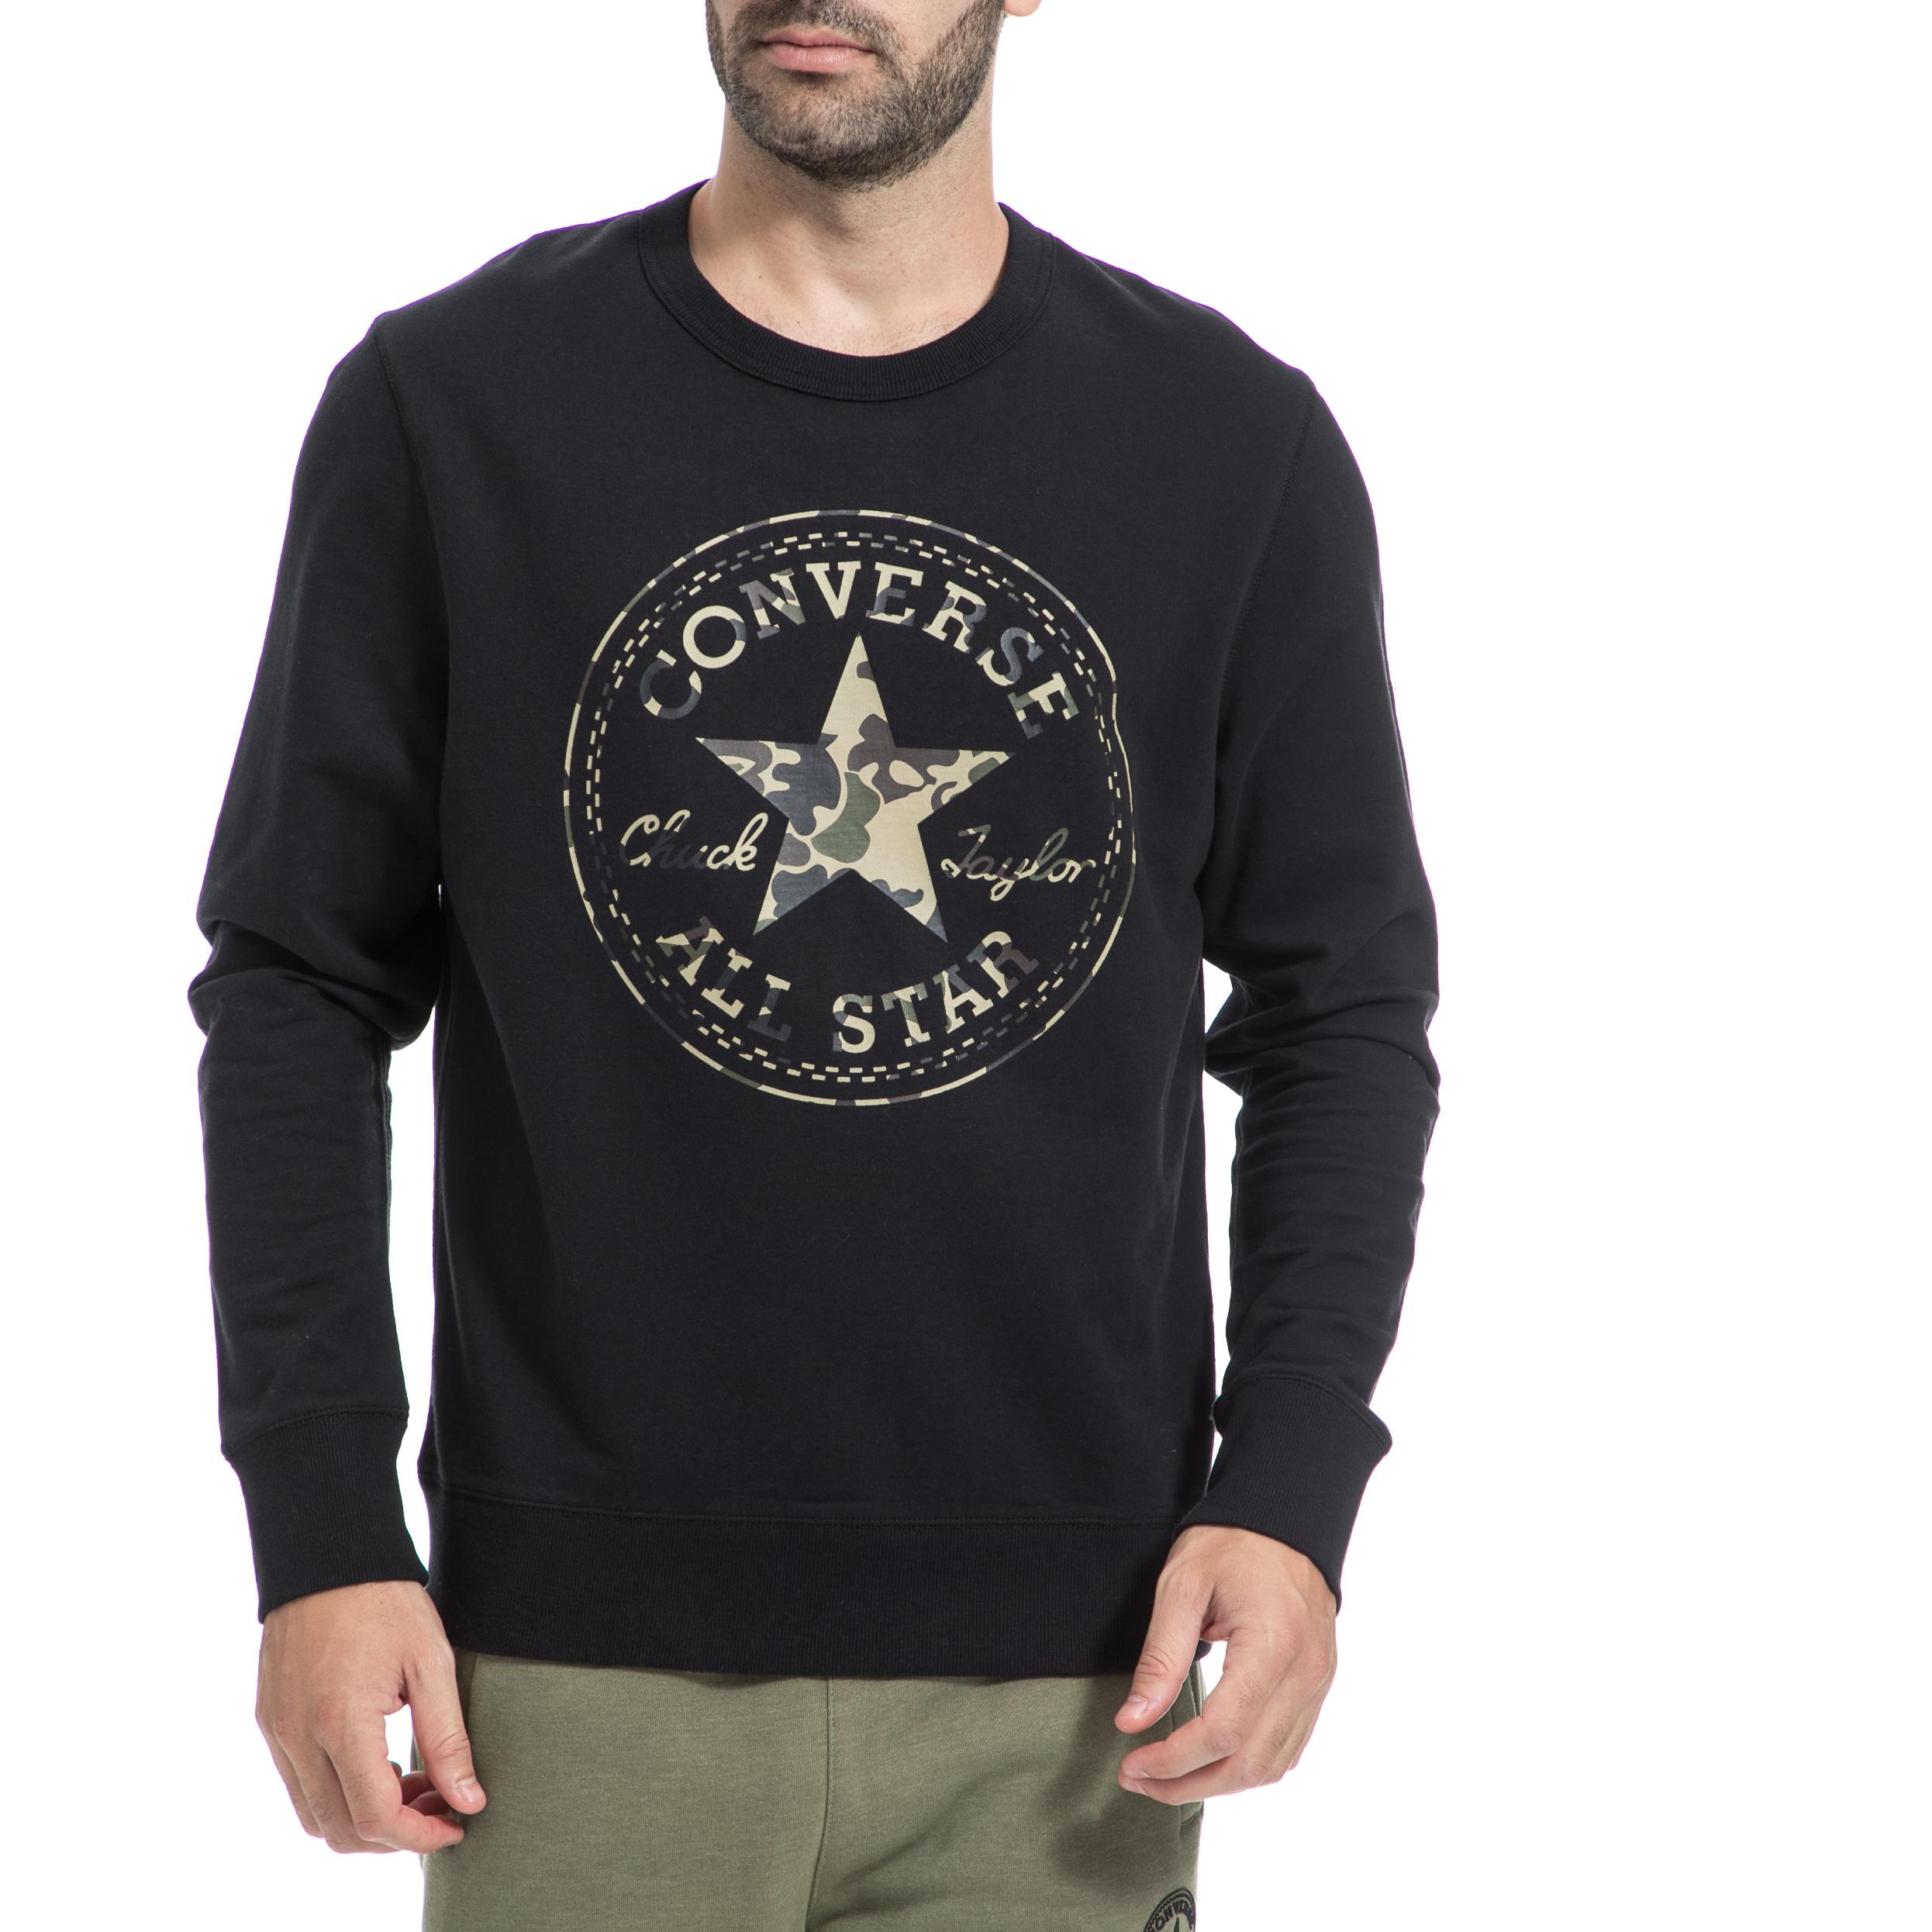 CONVERSE - Ανρικό φούτερ CONVERSE μαύρο ανδρικά ρούχα αθλητικά φούτερ μακρυμάνικα